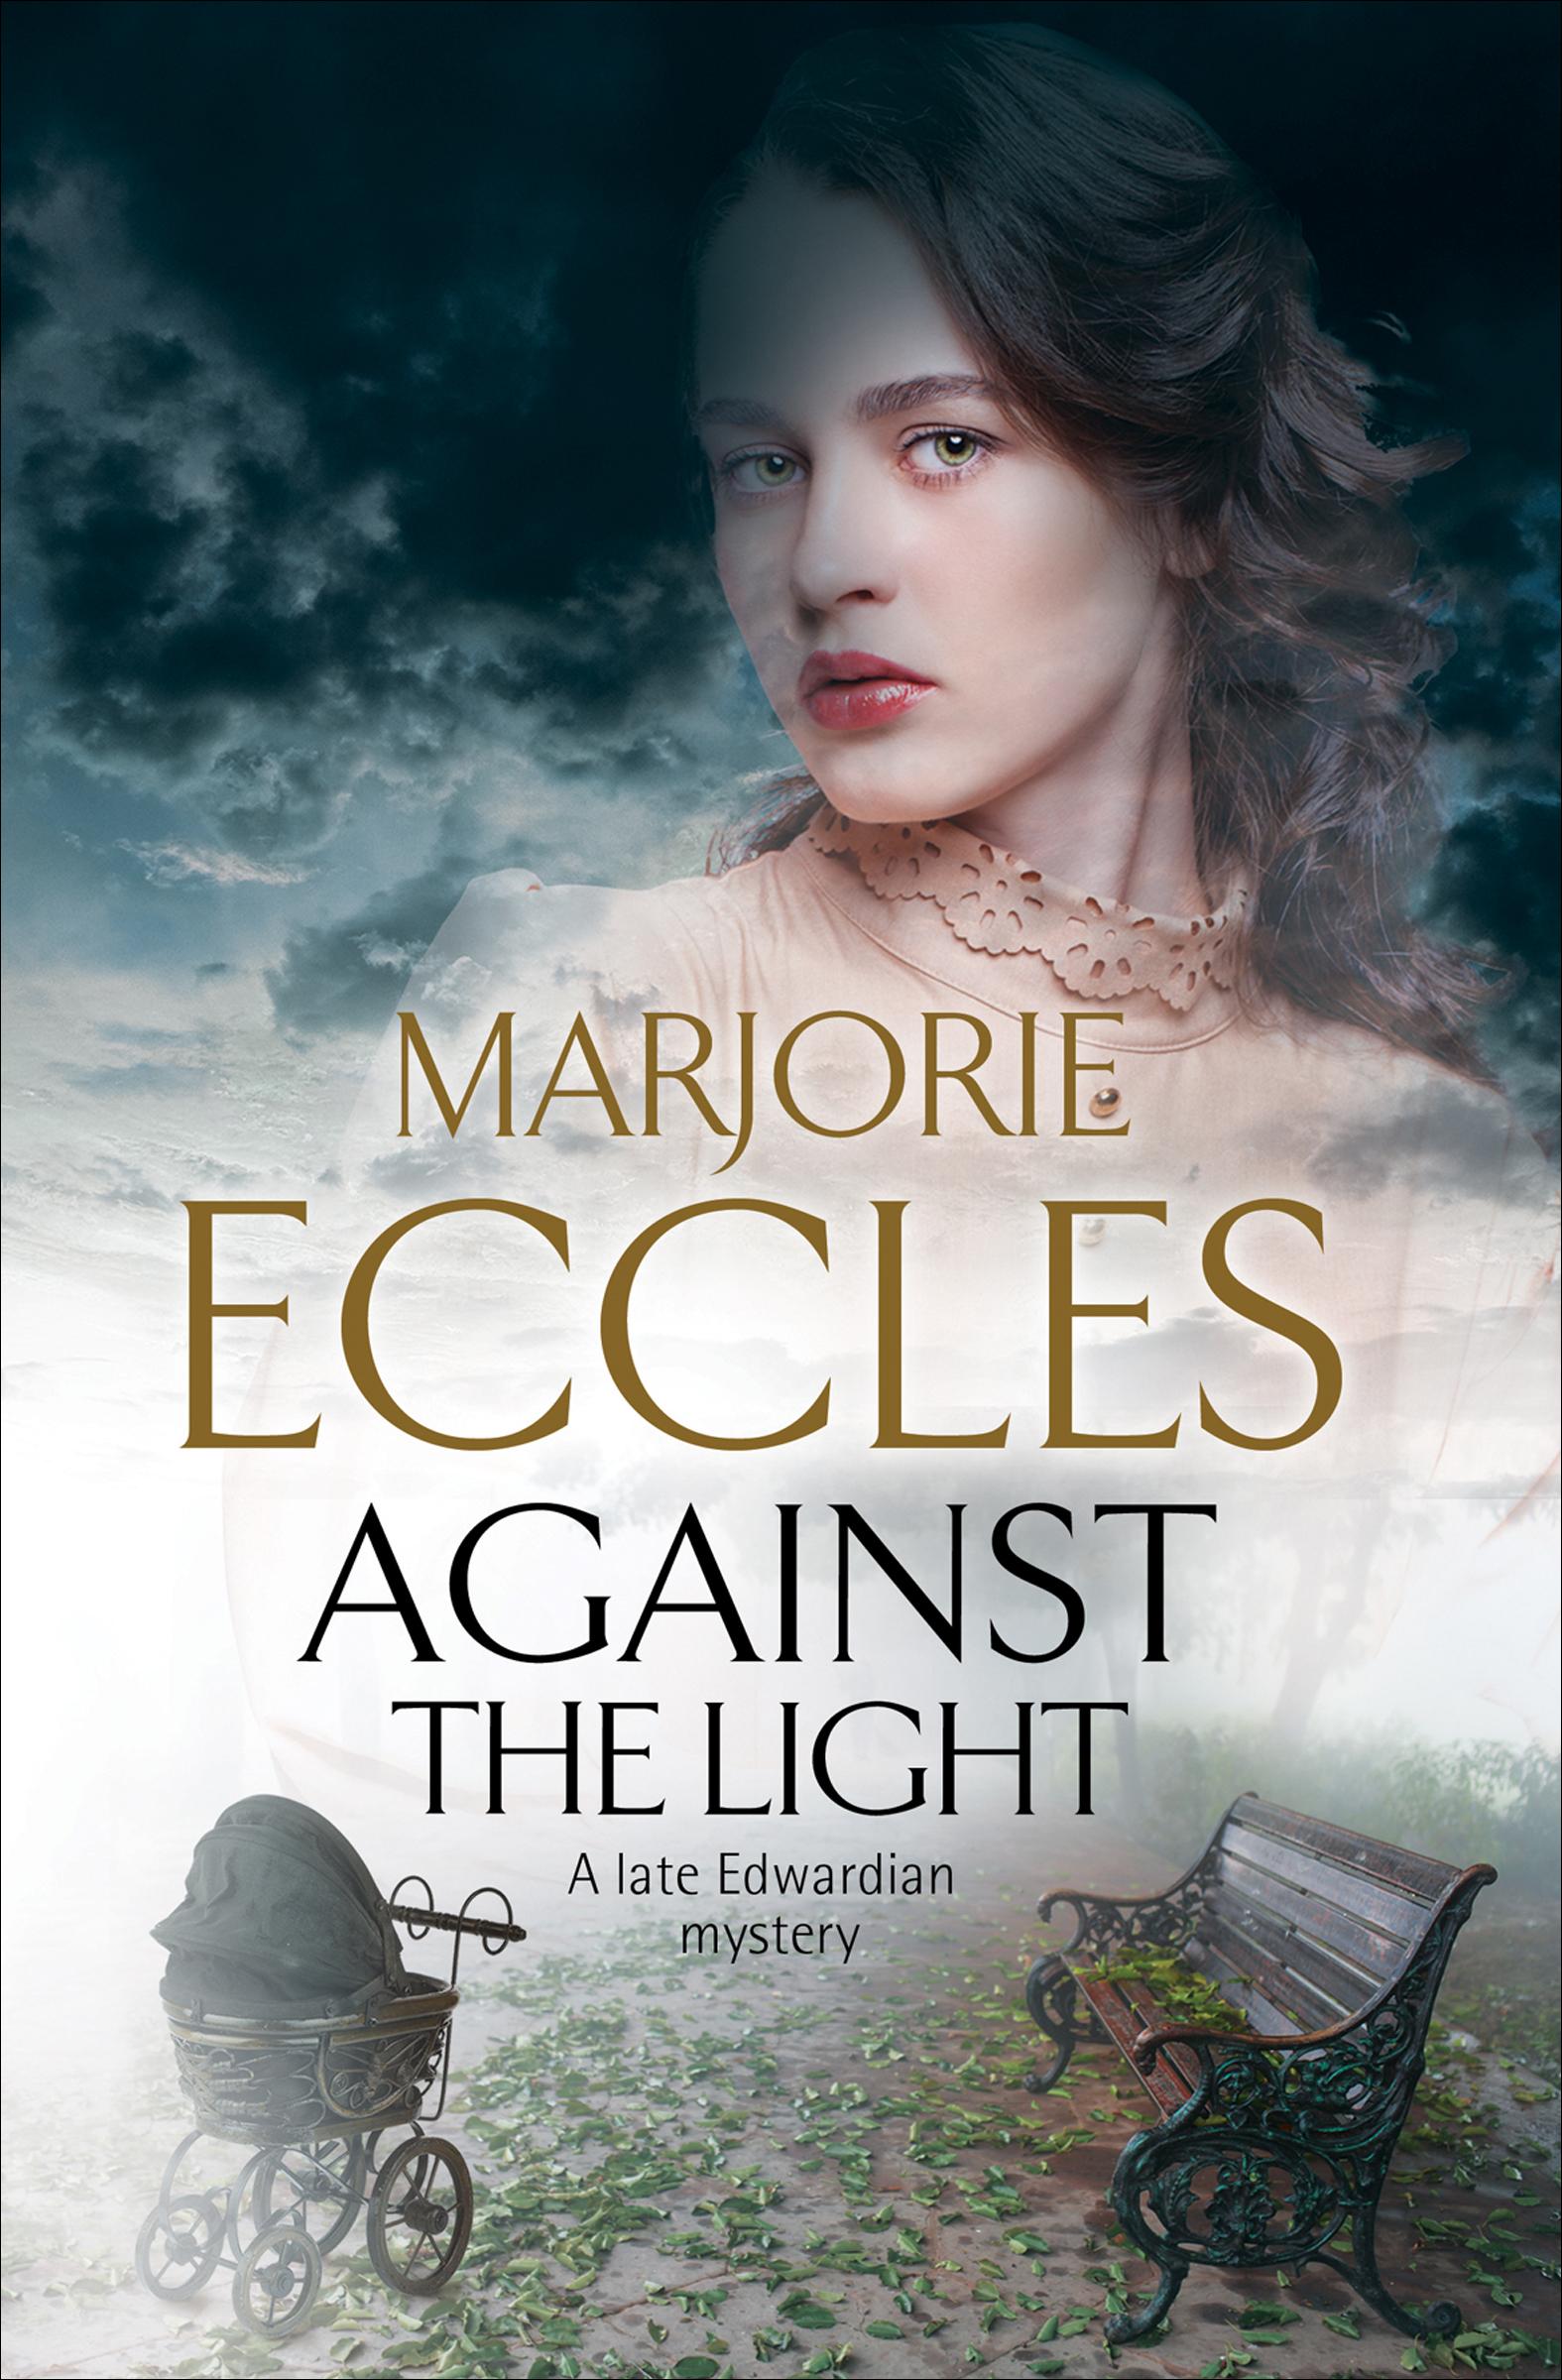 Against The Light An Irish Nationalist mystery set in Edwardian London